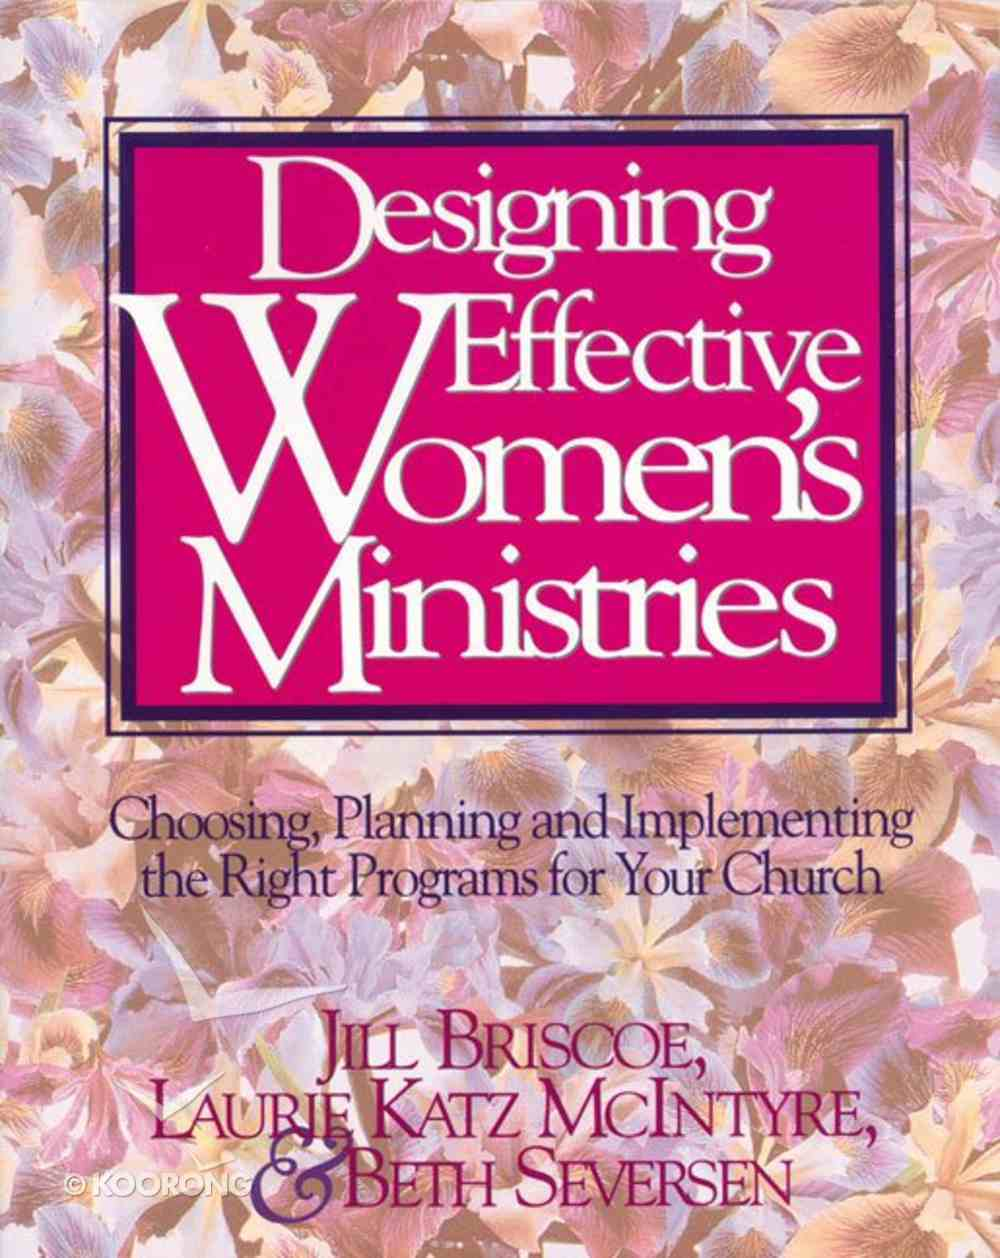 Designing Effective Women's Ministries eBook